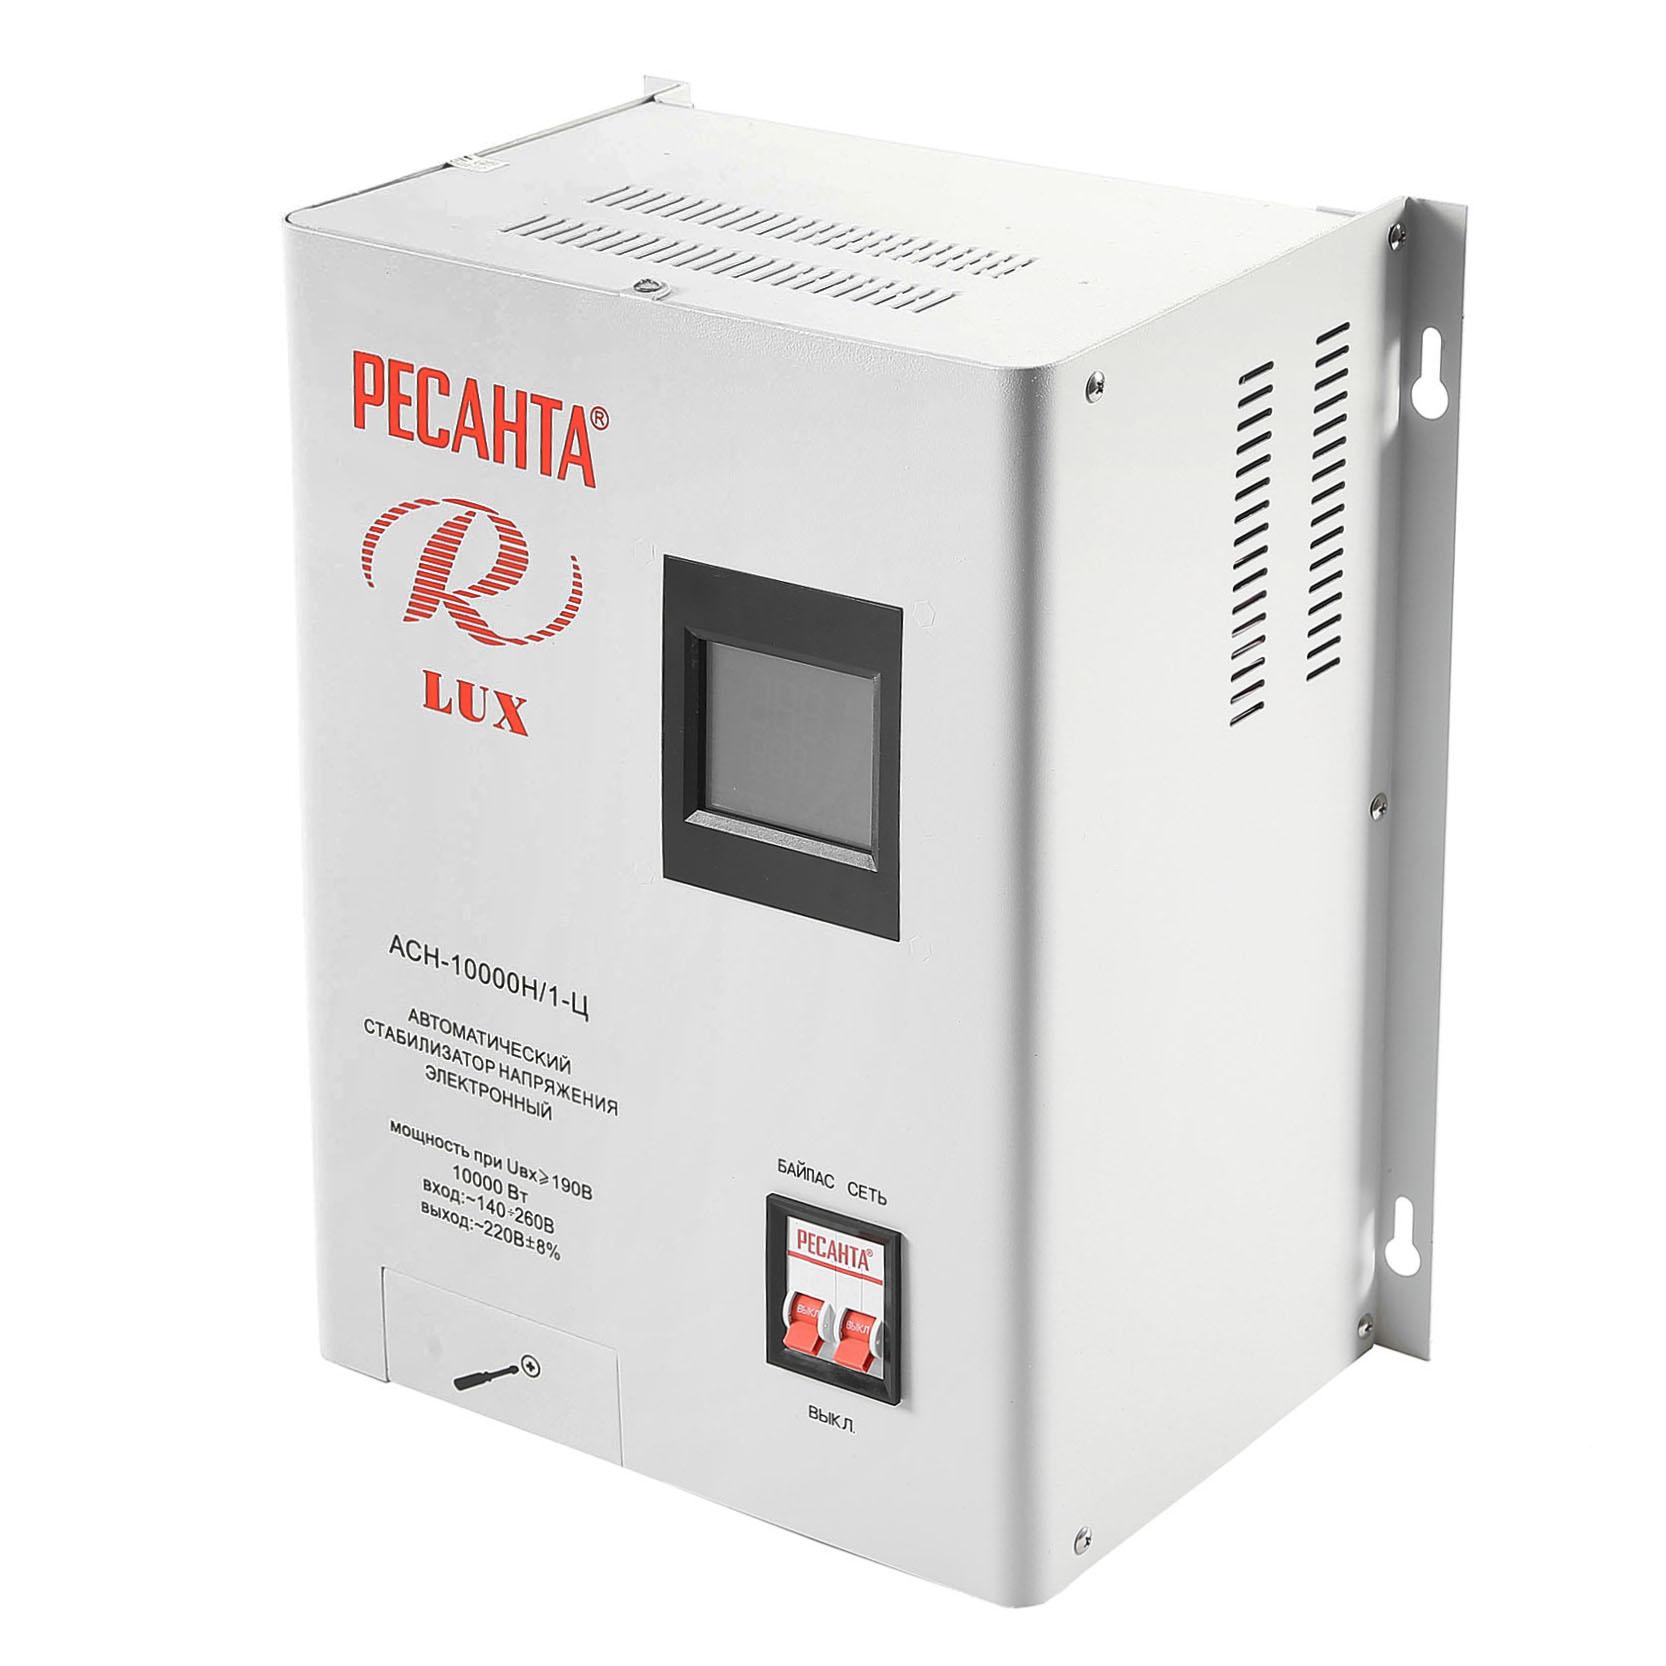 Стабилизатор напряжения РЕСАНТА АСН-10000 Н/1-Ц стабилизатор напряжения ресанта ach 10000 1 ц 1 розетка серый